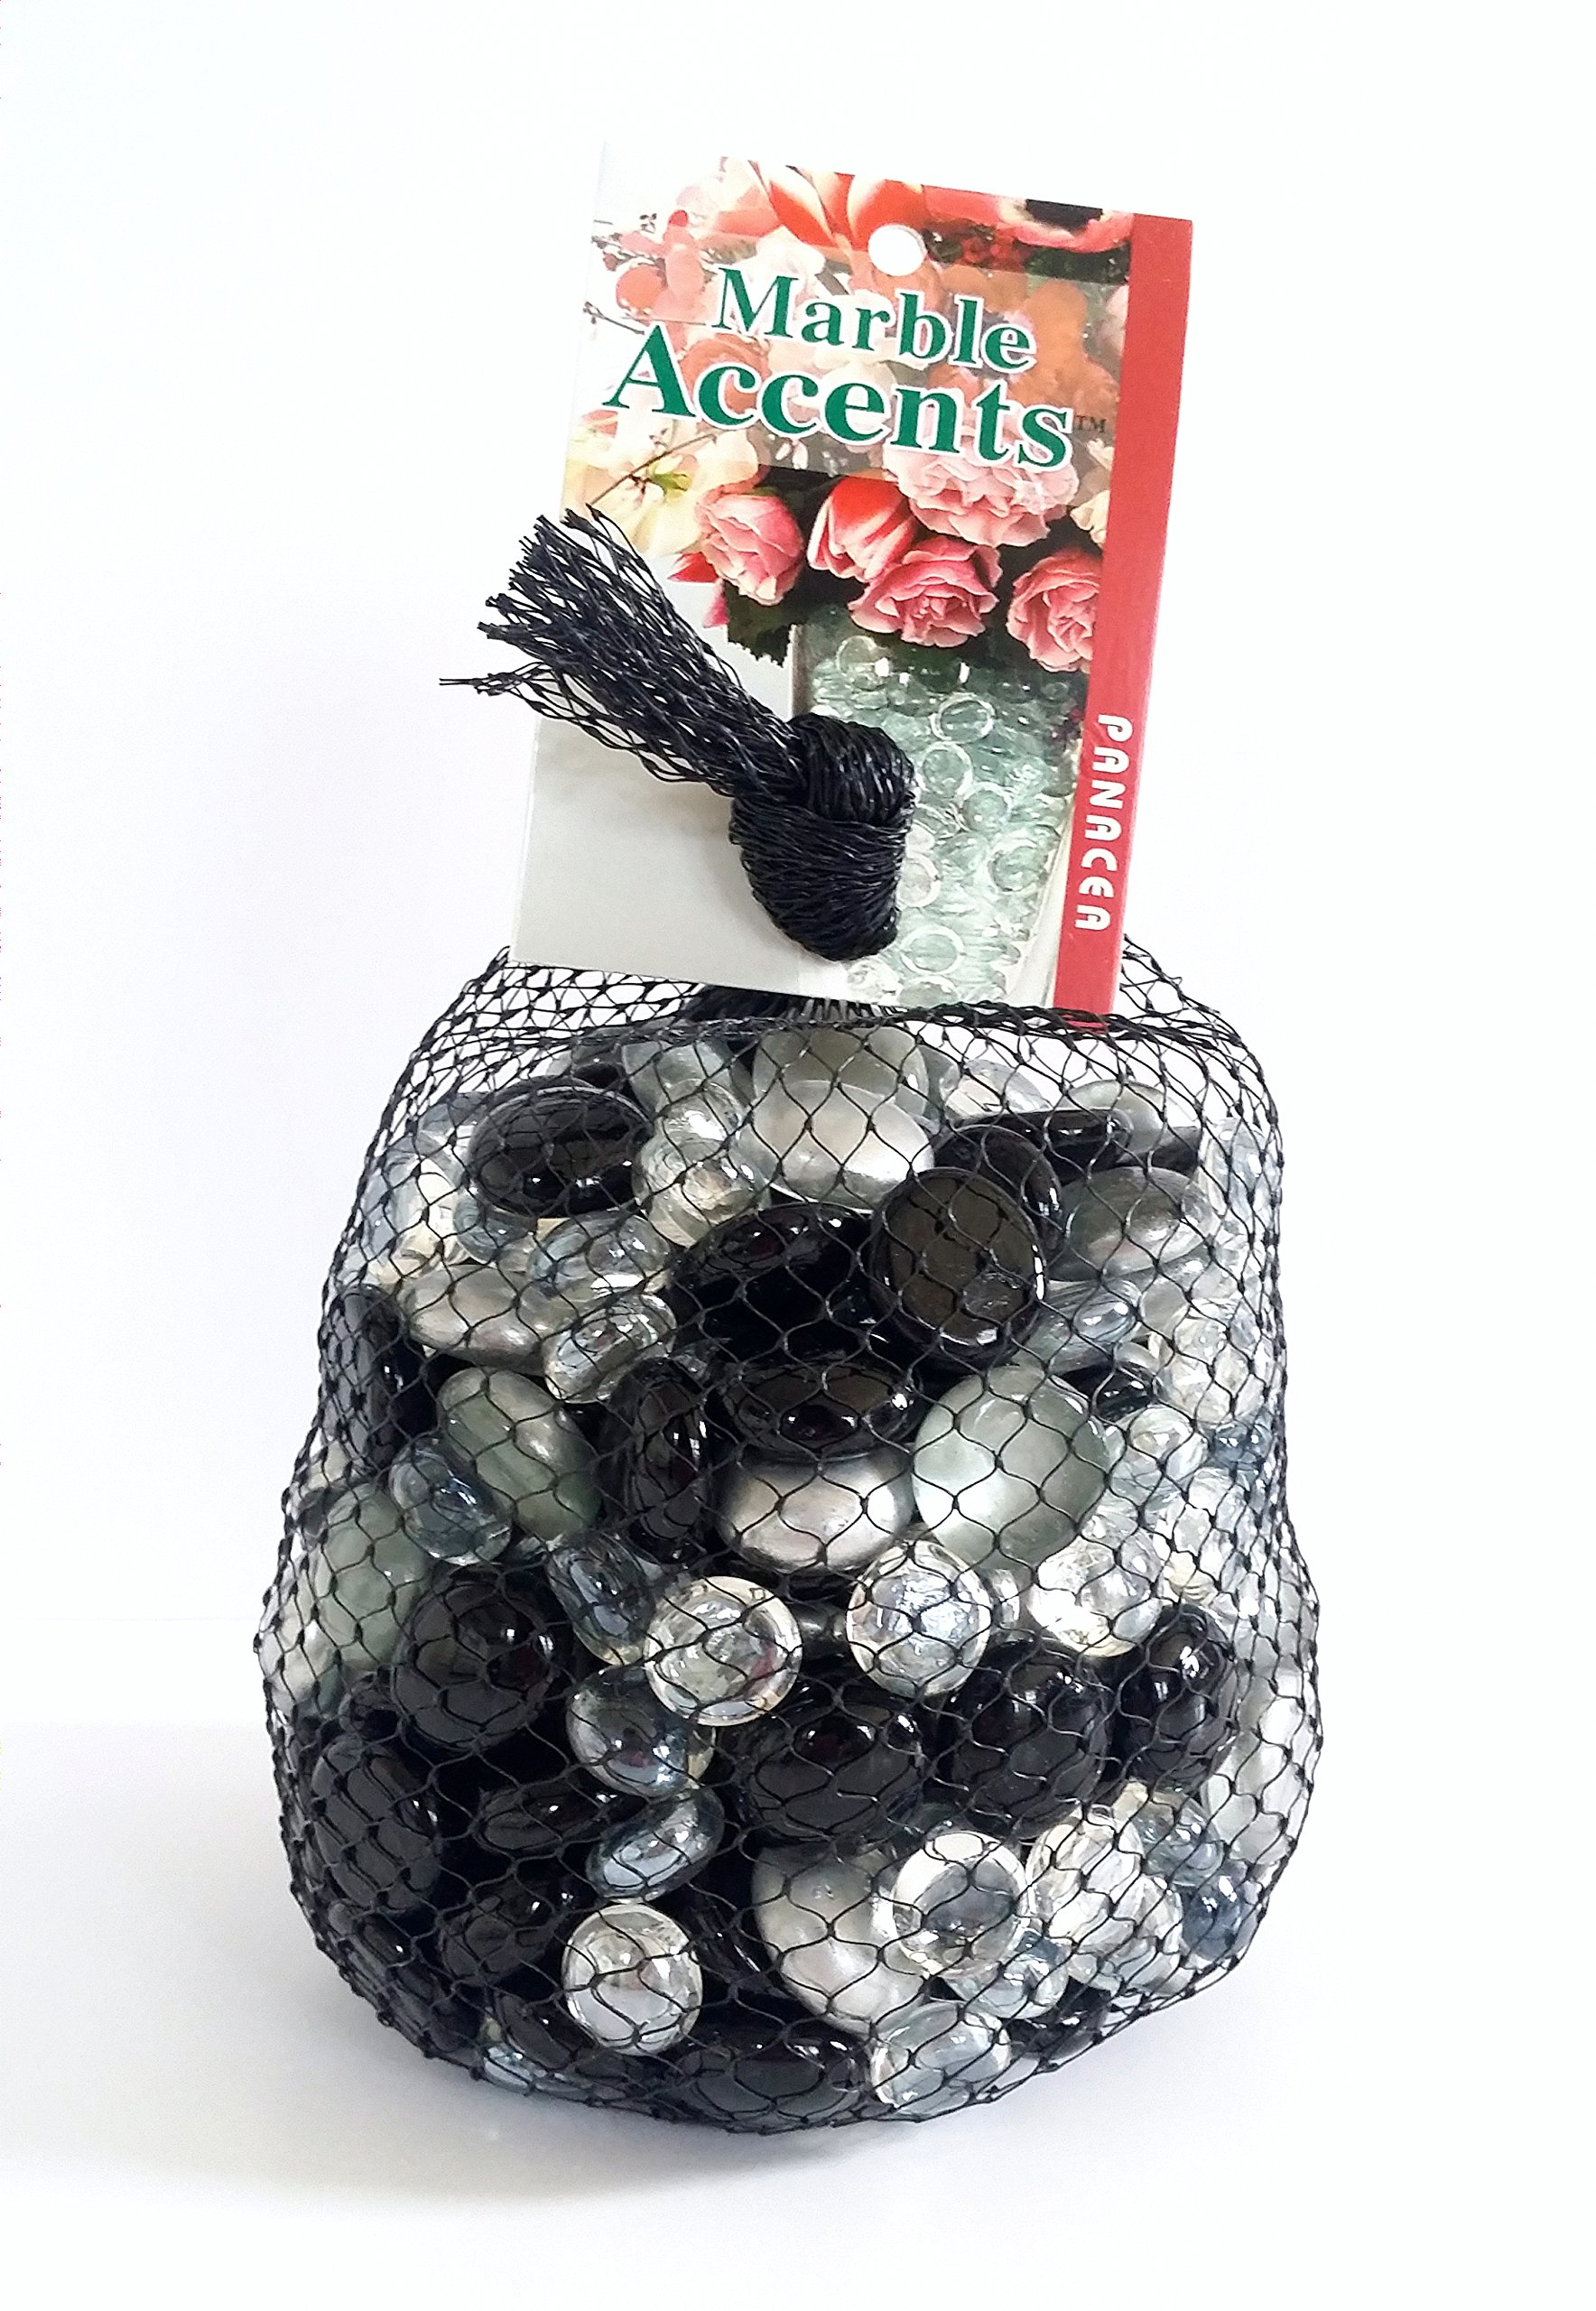 Panacea Products Marble Accents Aquarium Decorative Glass Gem Marble, Black, Silver & Clear, 3lb